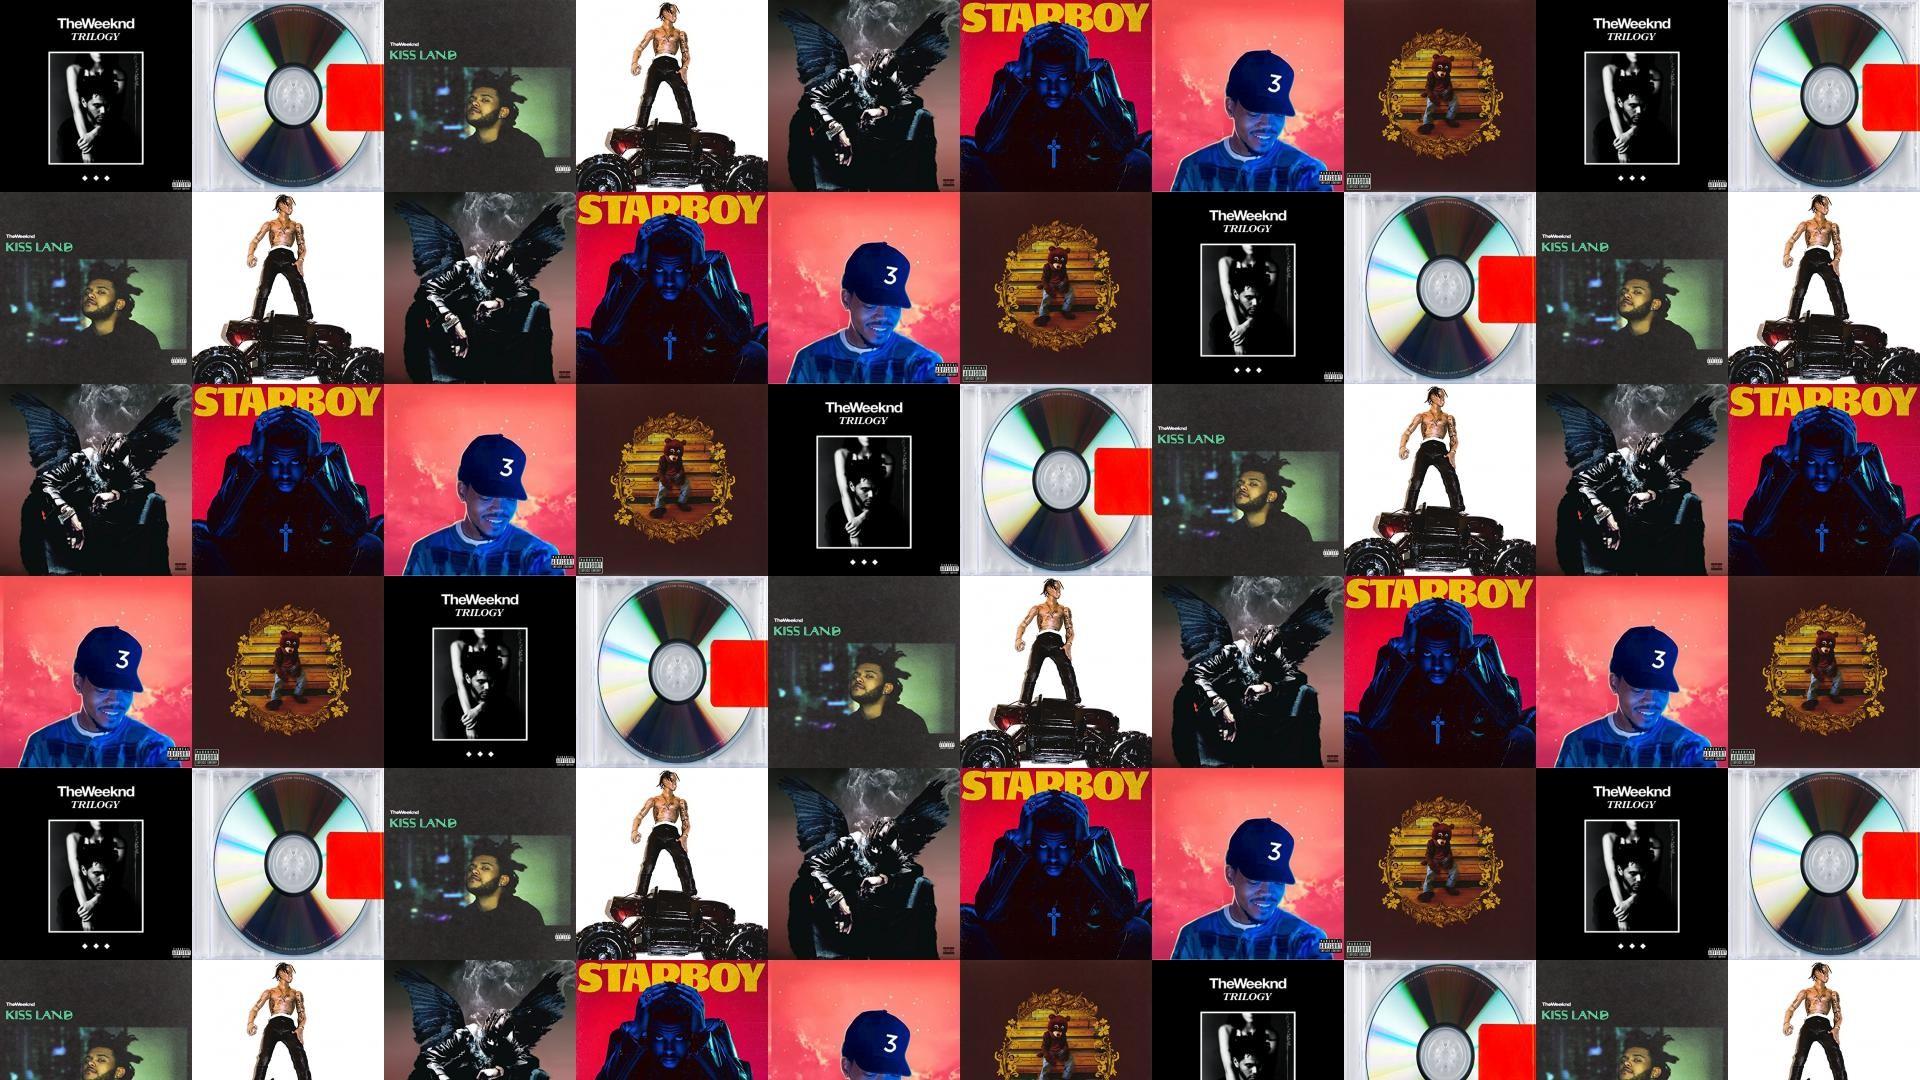 Travis Scott wallpaper 183 Download free amazing HD